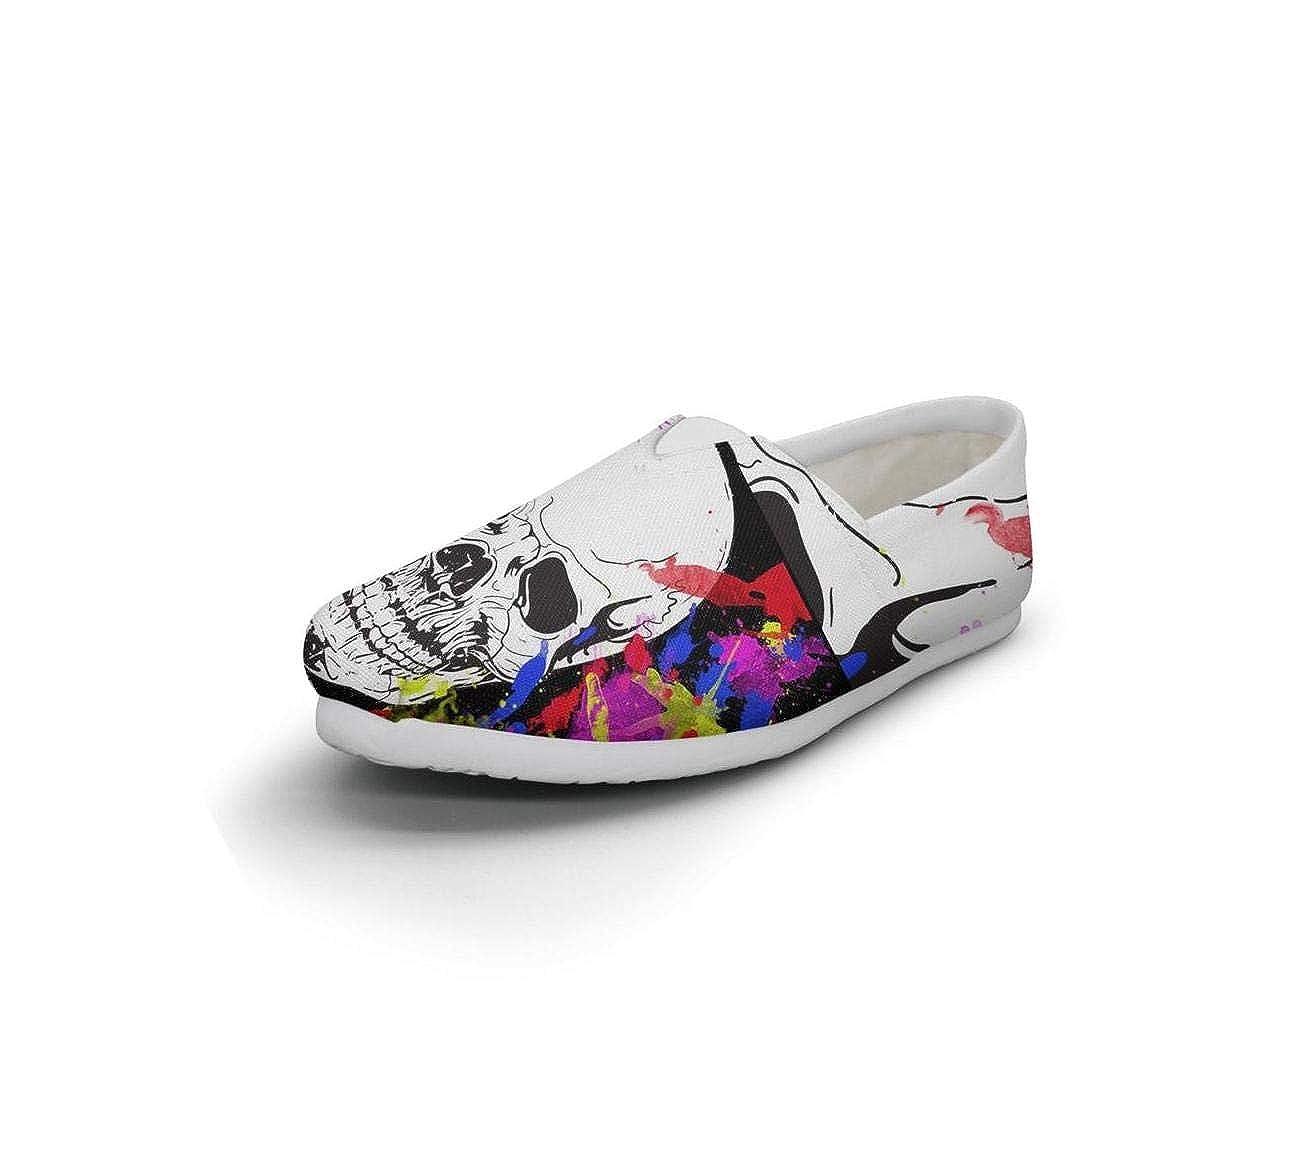 nkfbx tie-dye-Skull Casual Slip-On Sneakers for Girls Jogging